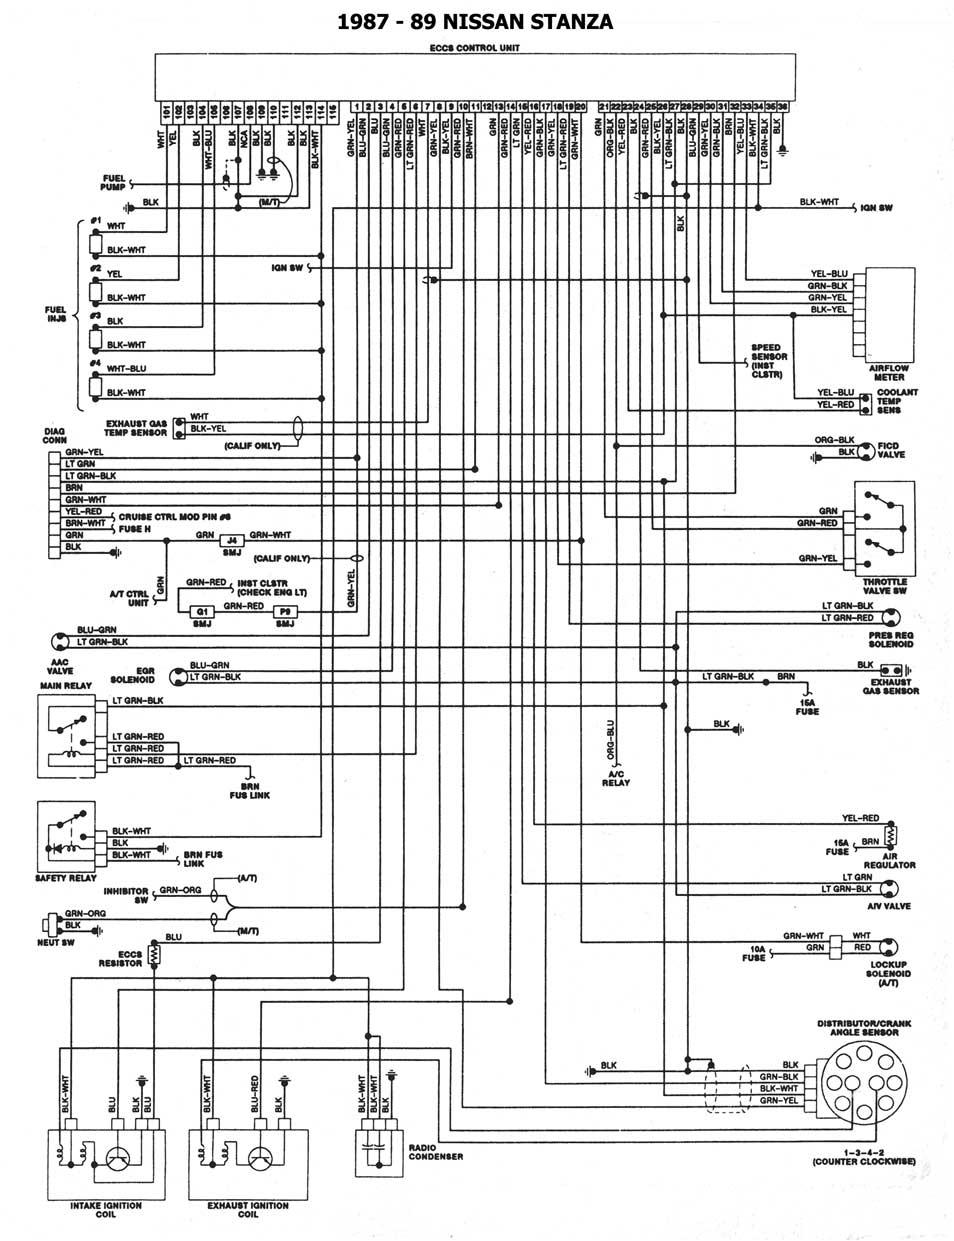 Nissan 1986 93 Diagramas Esquemas Ubicacion De Componentes 1991 Stanza Engine Diagram 1987 89 Esquema Electrico